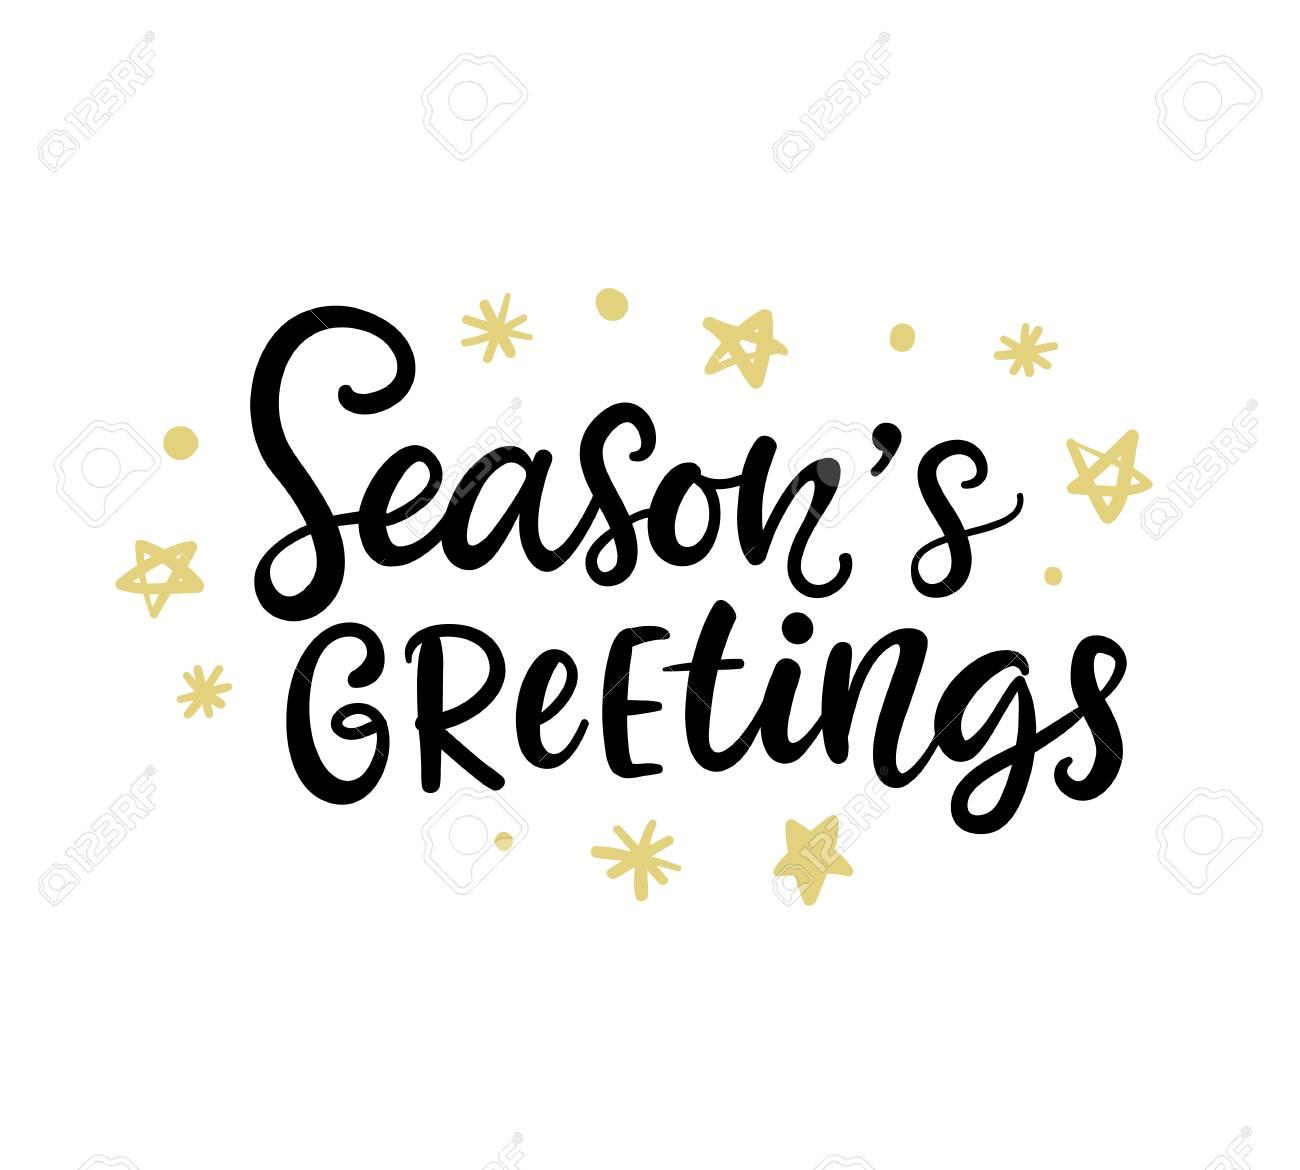 Christmas Ink Hand Lettering Seasons Greetings Phrase Royalty Free